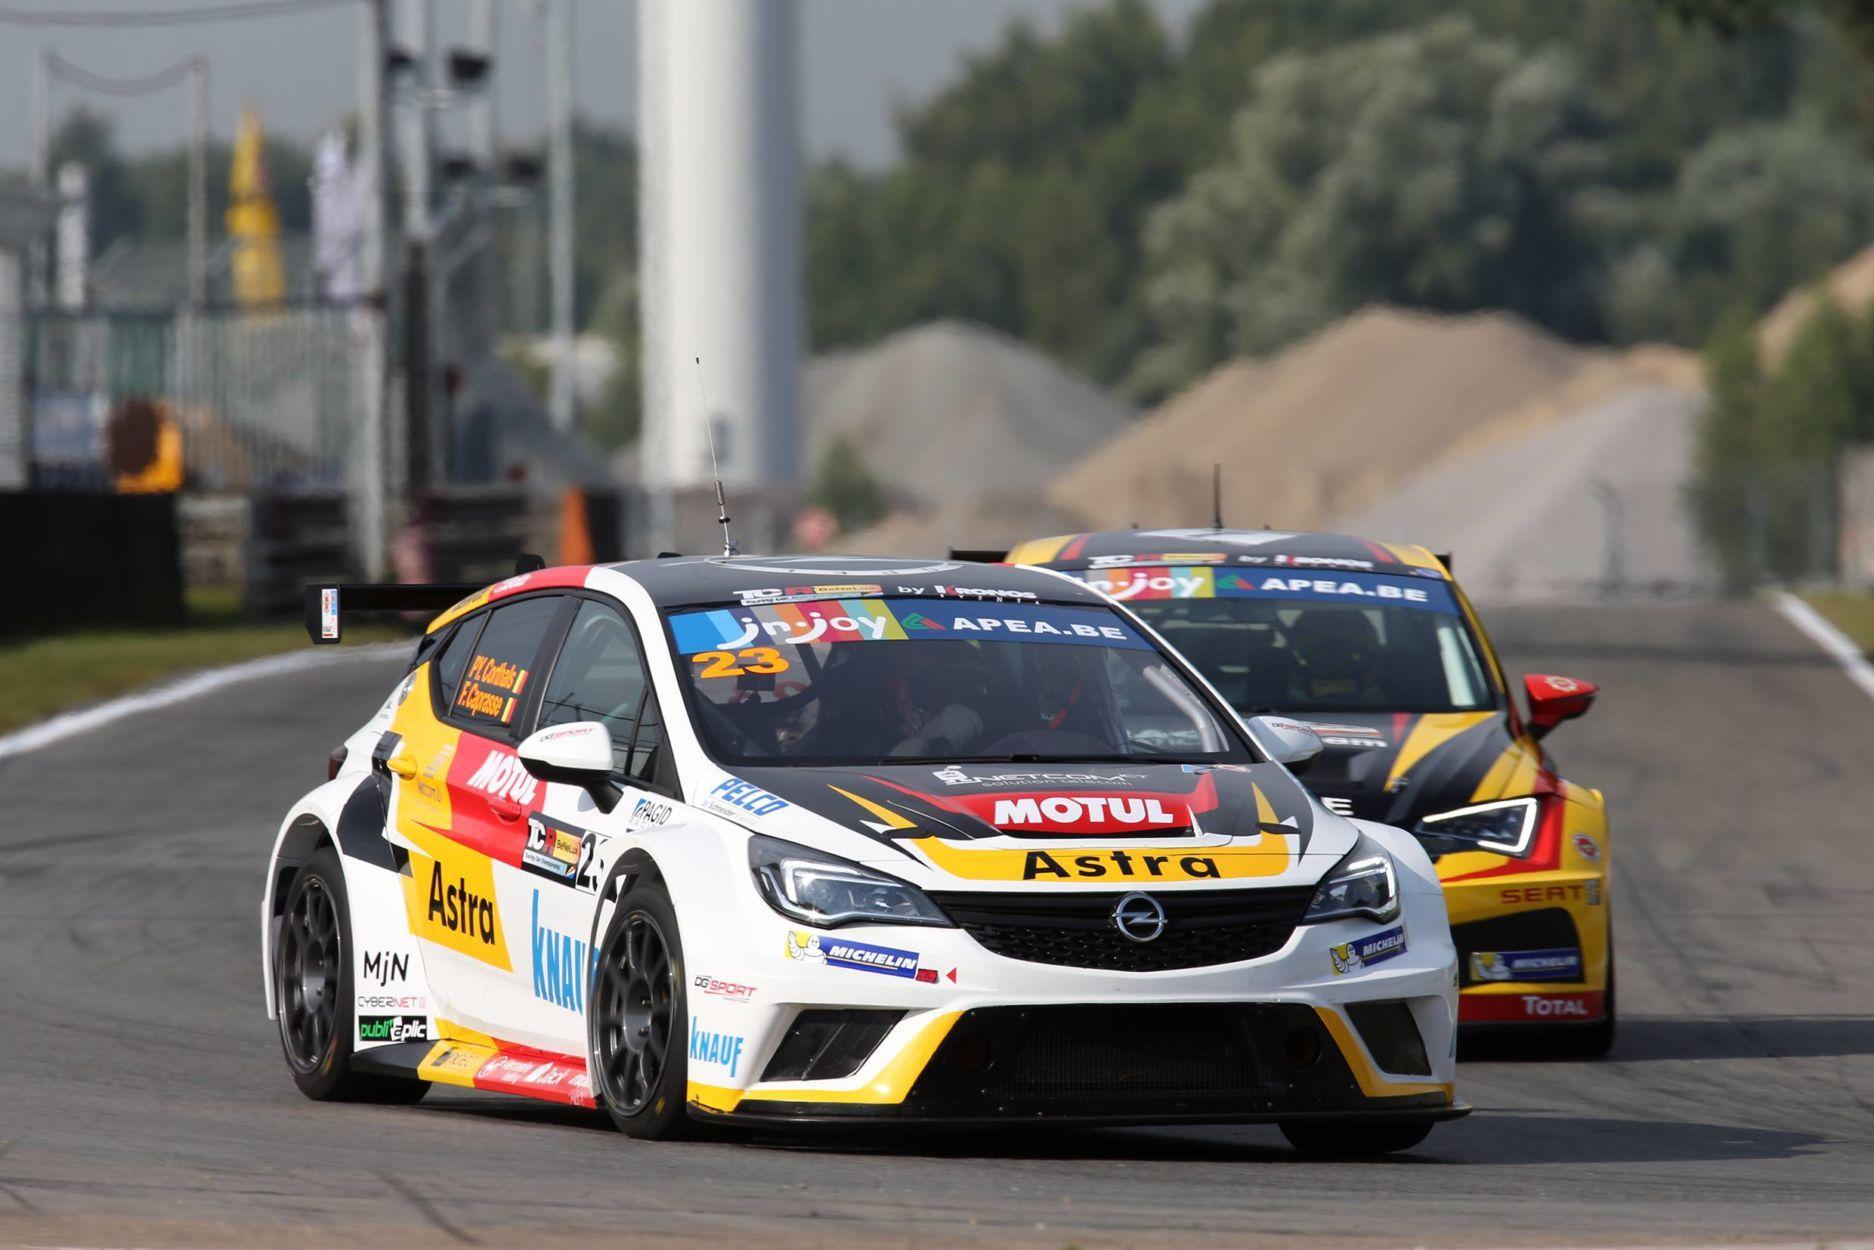 TCRBenelux_2016_Zolder_Sprint4_Corthals_Opel